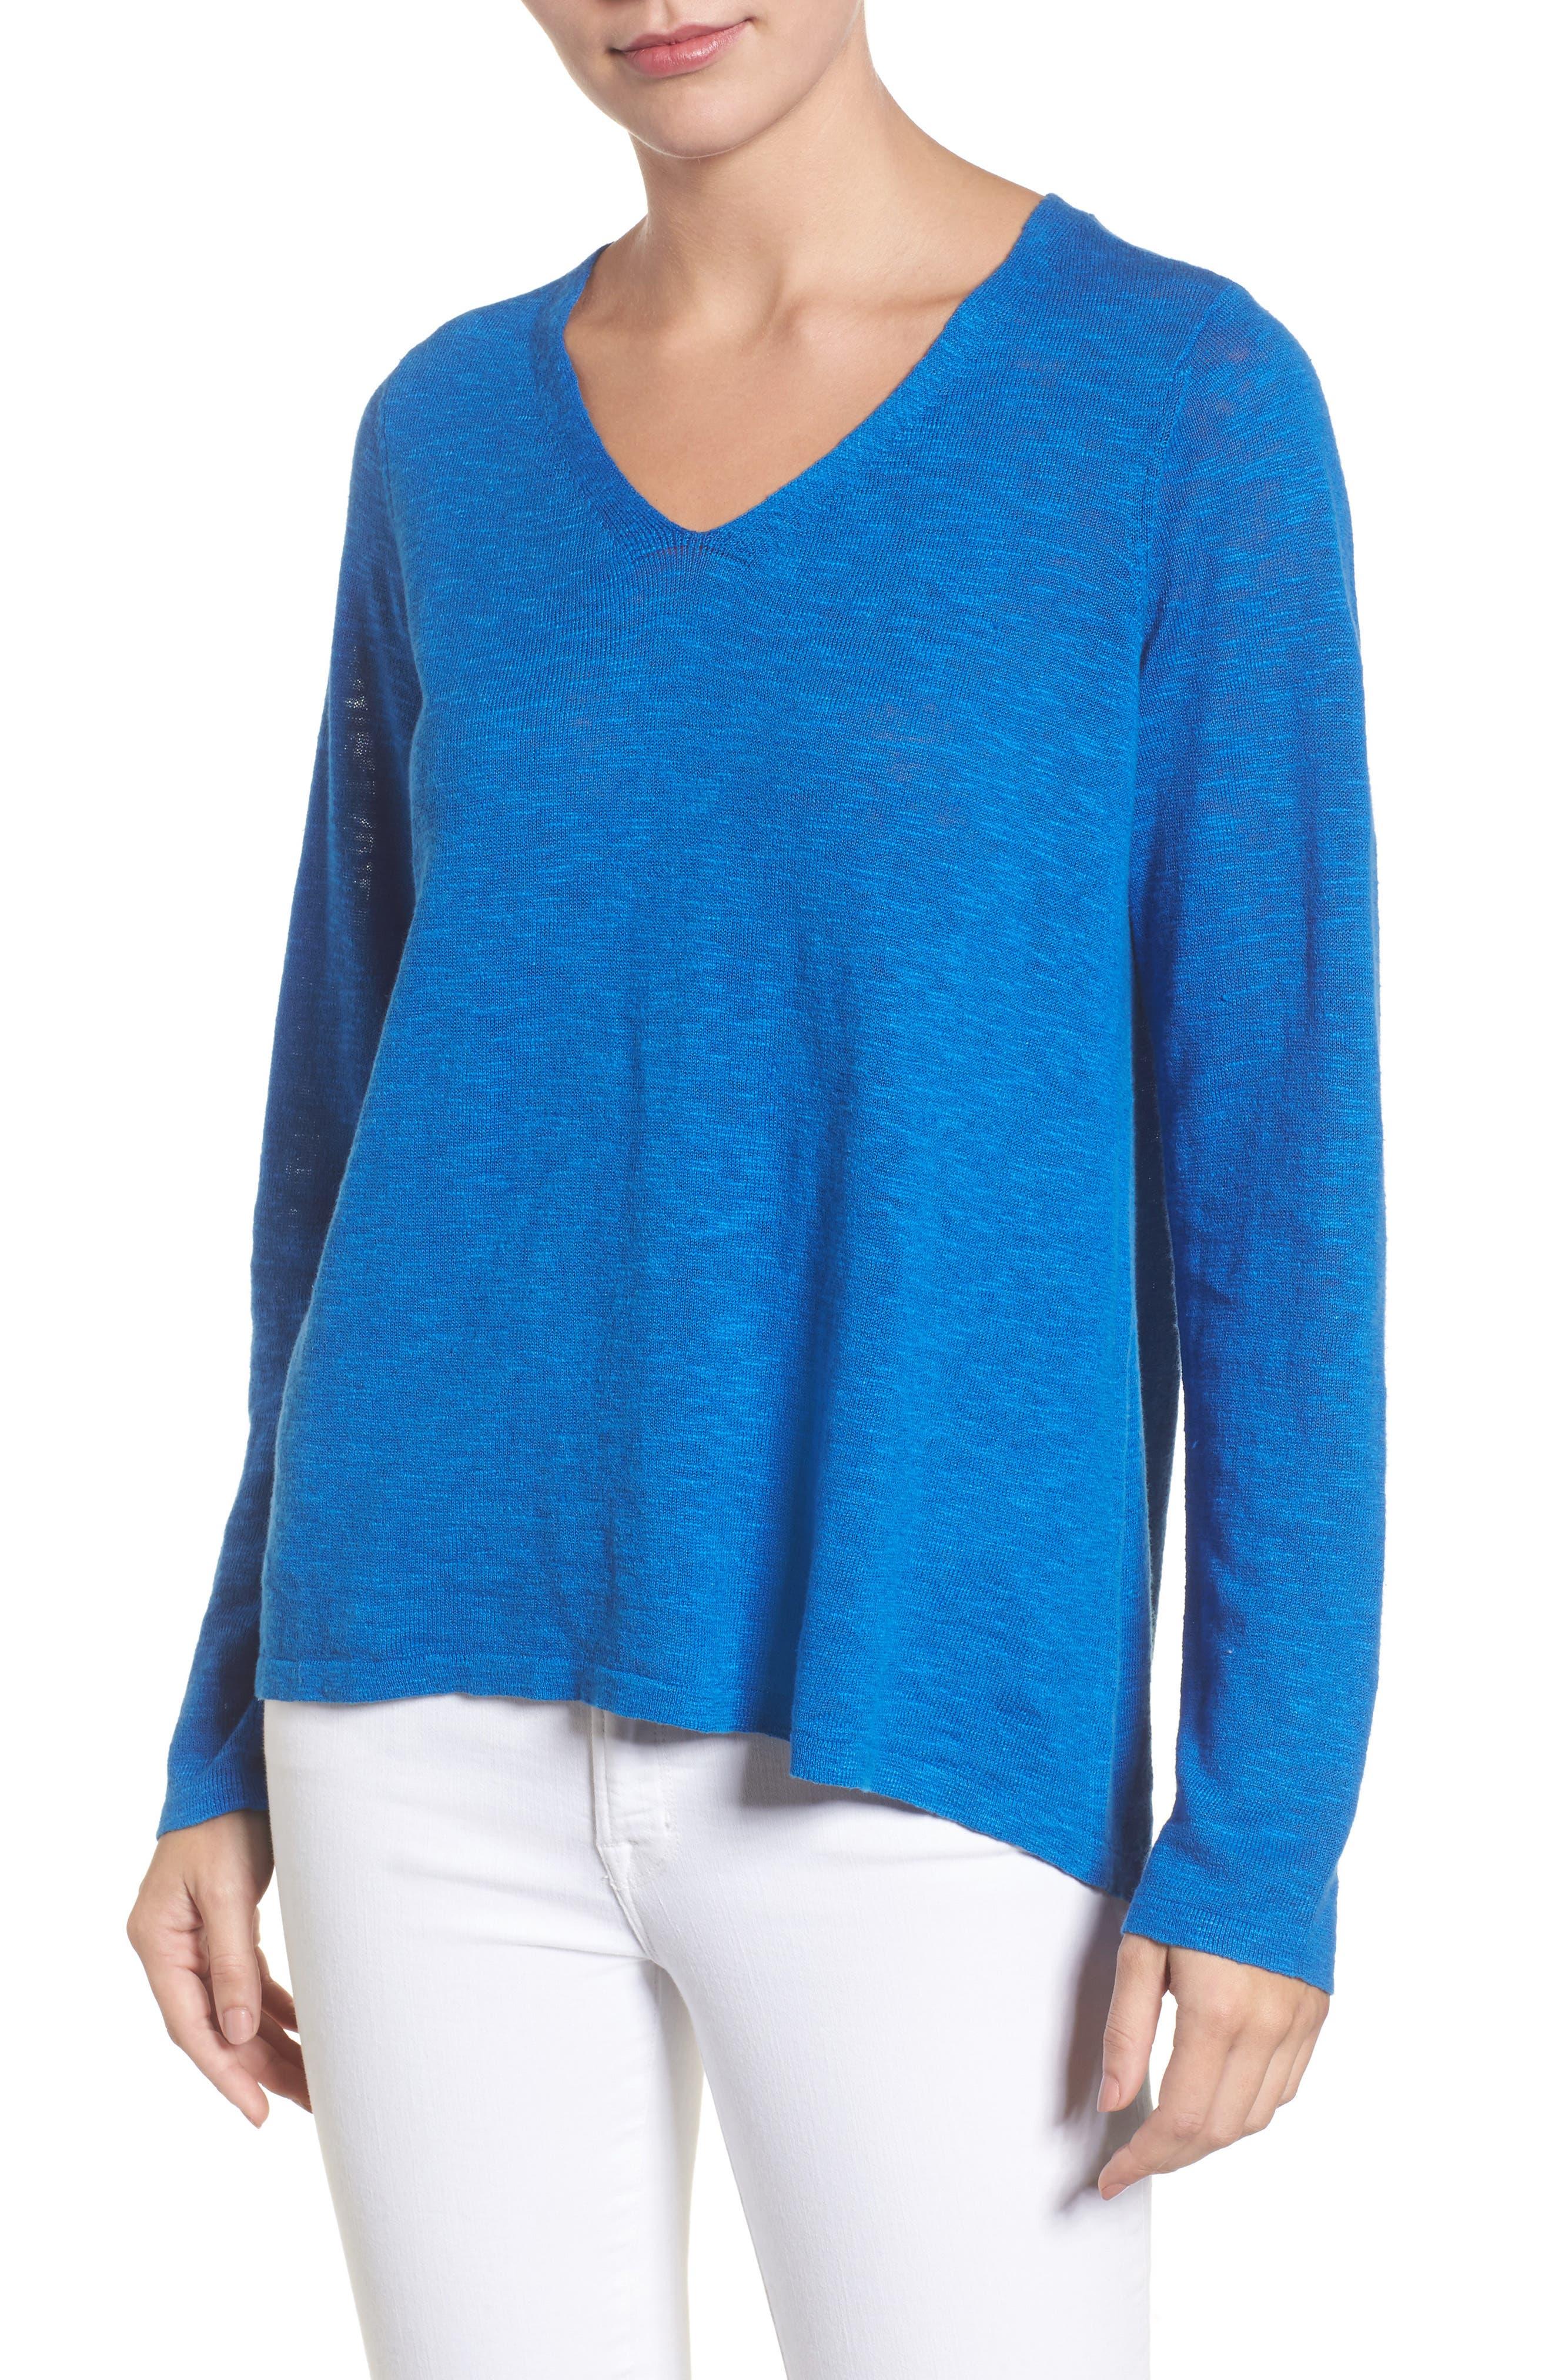 Organic Linen & Cotton V-Neck Sweater,                             Main thumbnail 1, color,                             Catalina